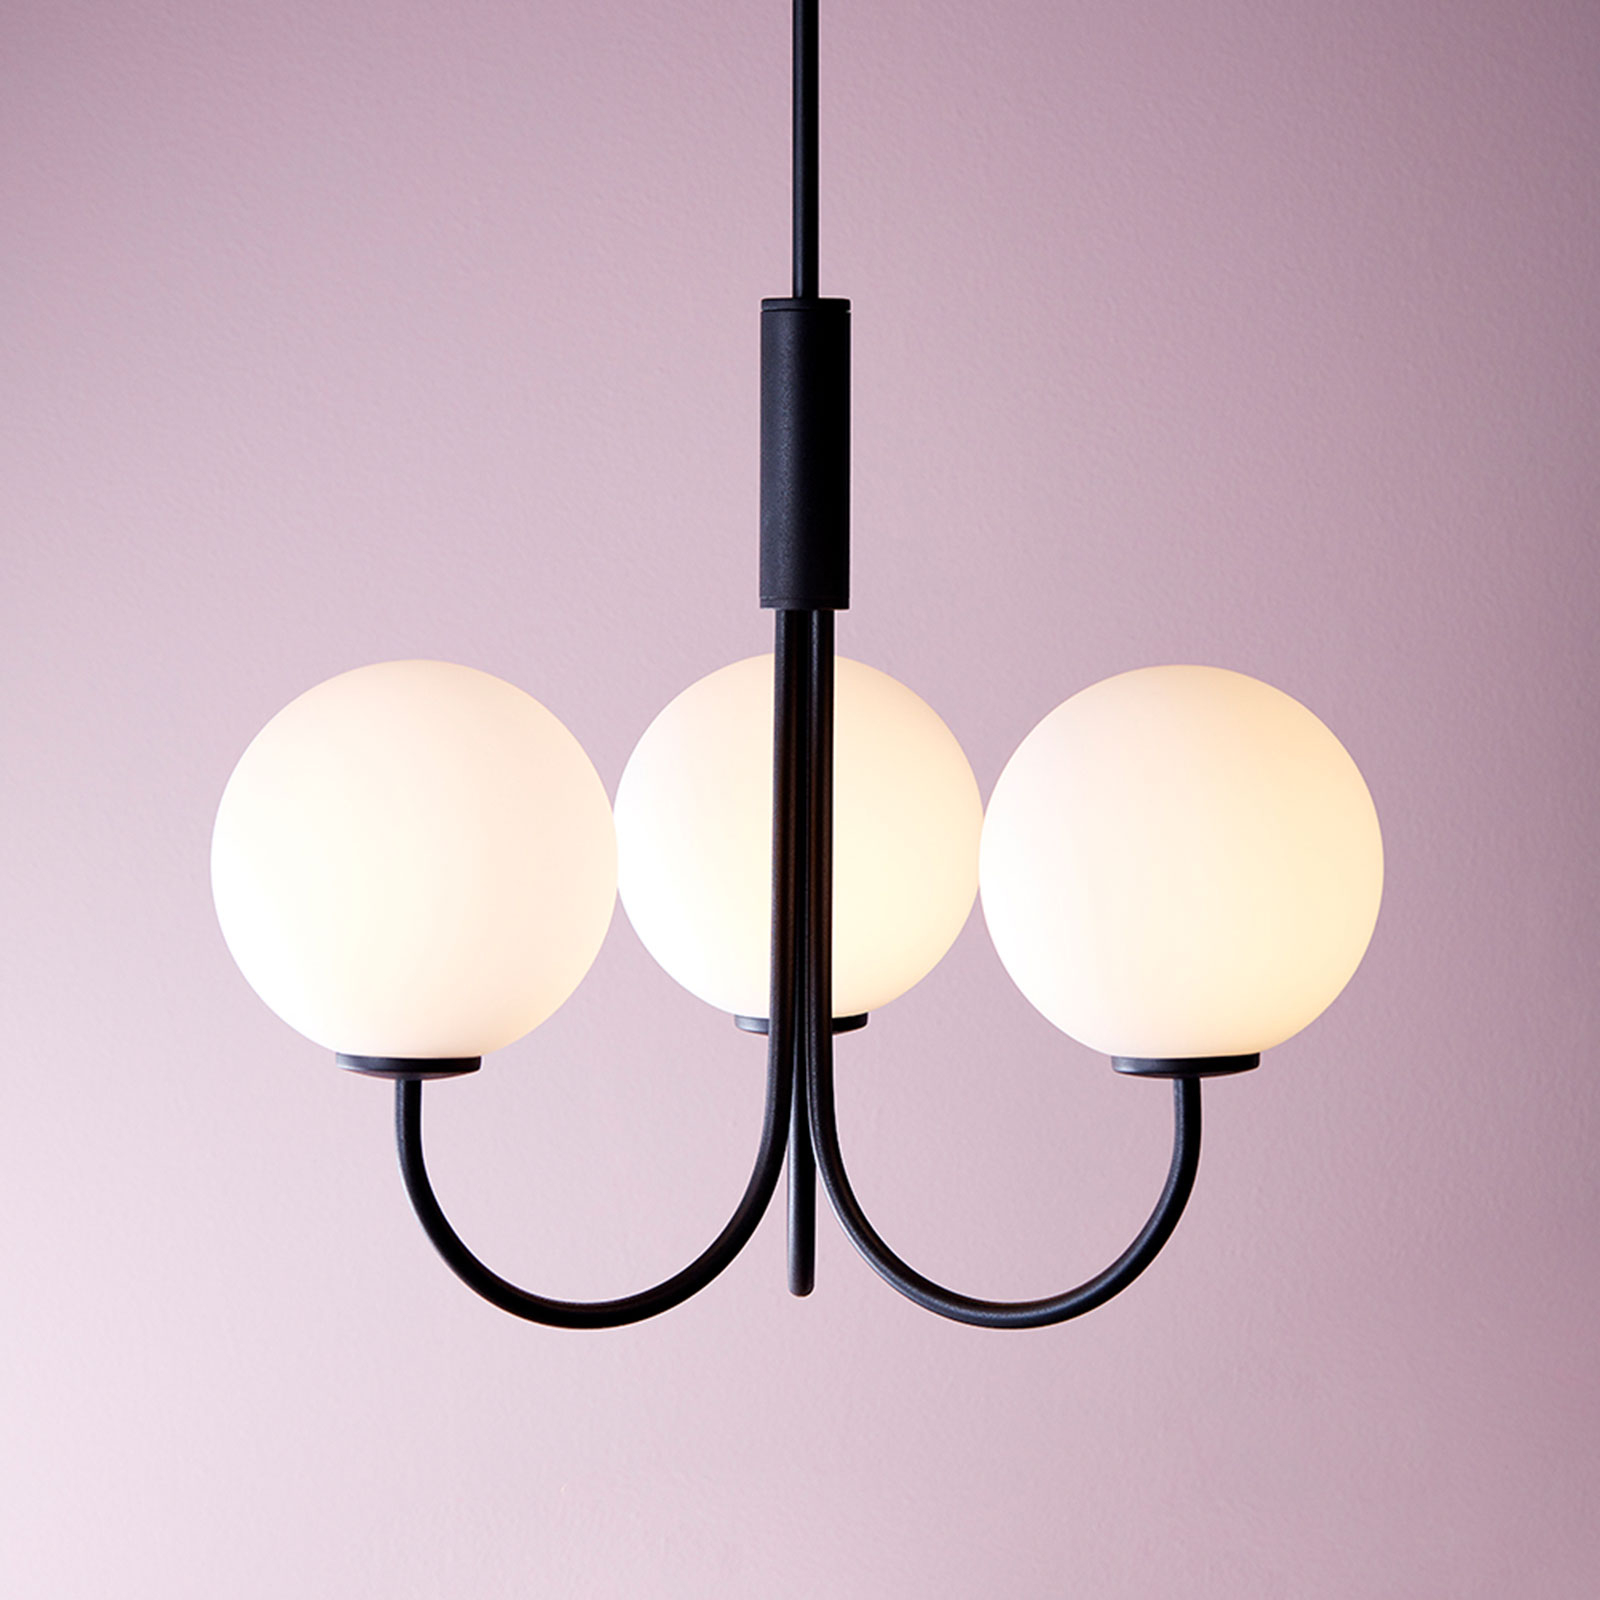 Lysekrone Ballon med bryter, 3 lyskilder, svart